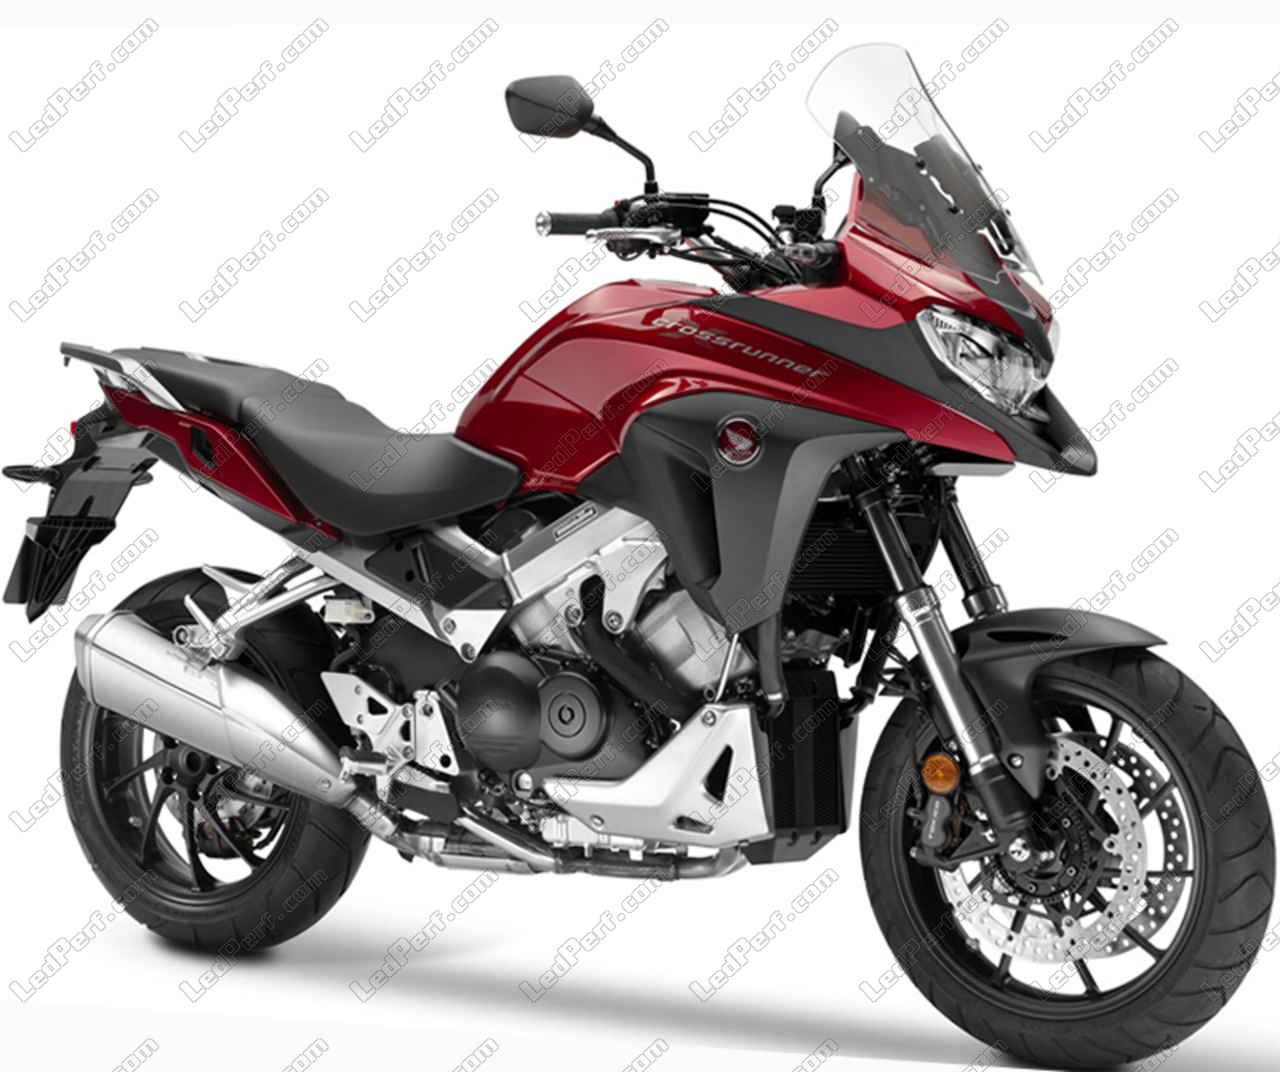 Additional Led Headlights For Motorcycle Honda Vfr 800 X Crossrunner